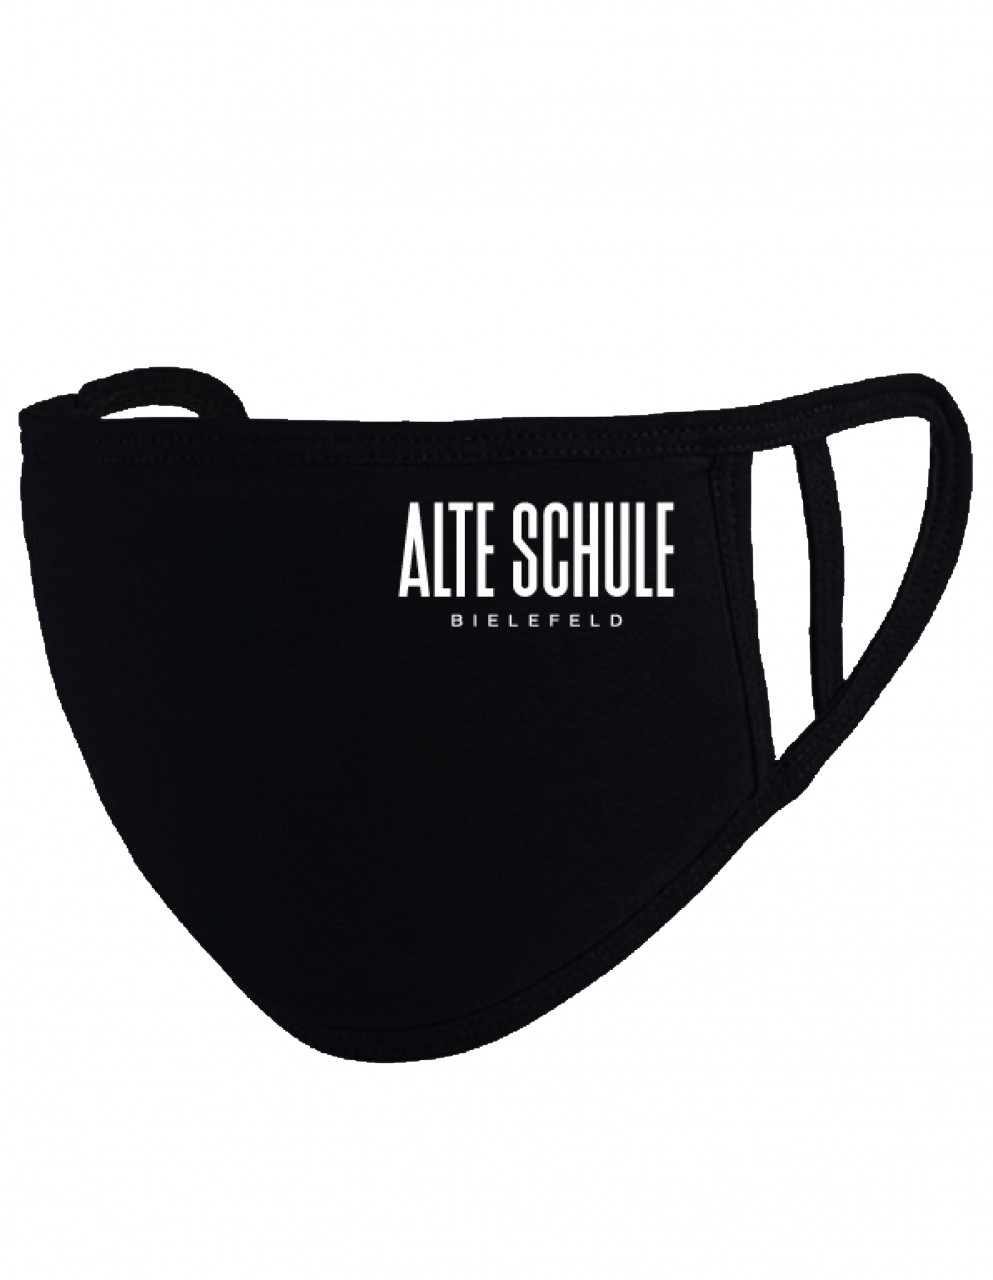 Alte Schule Mask